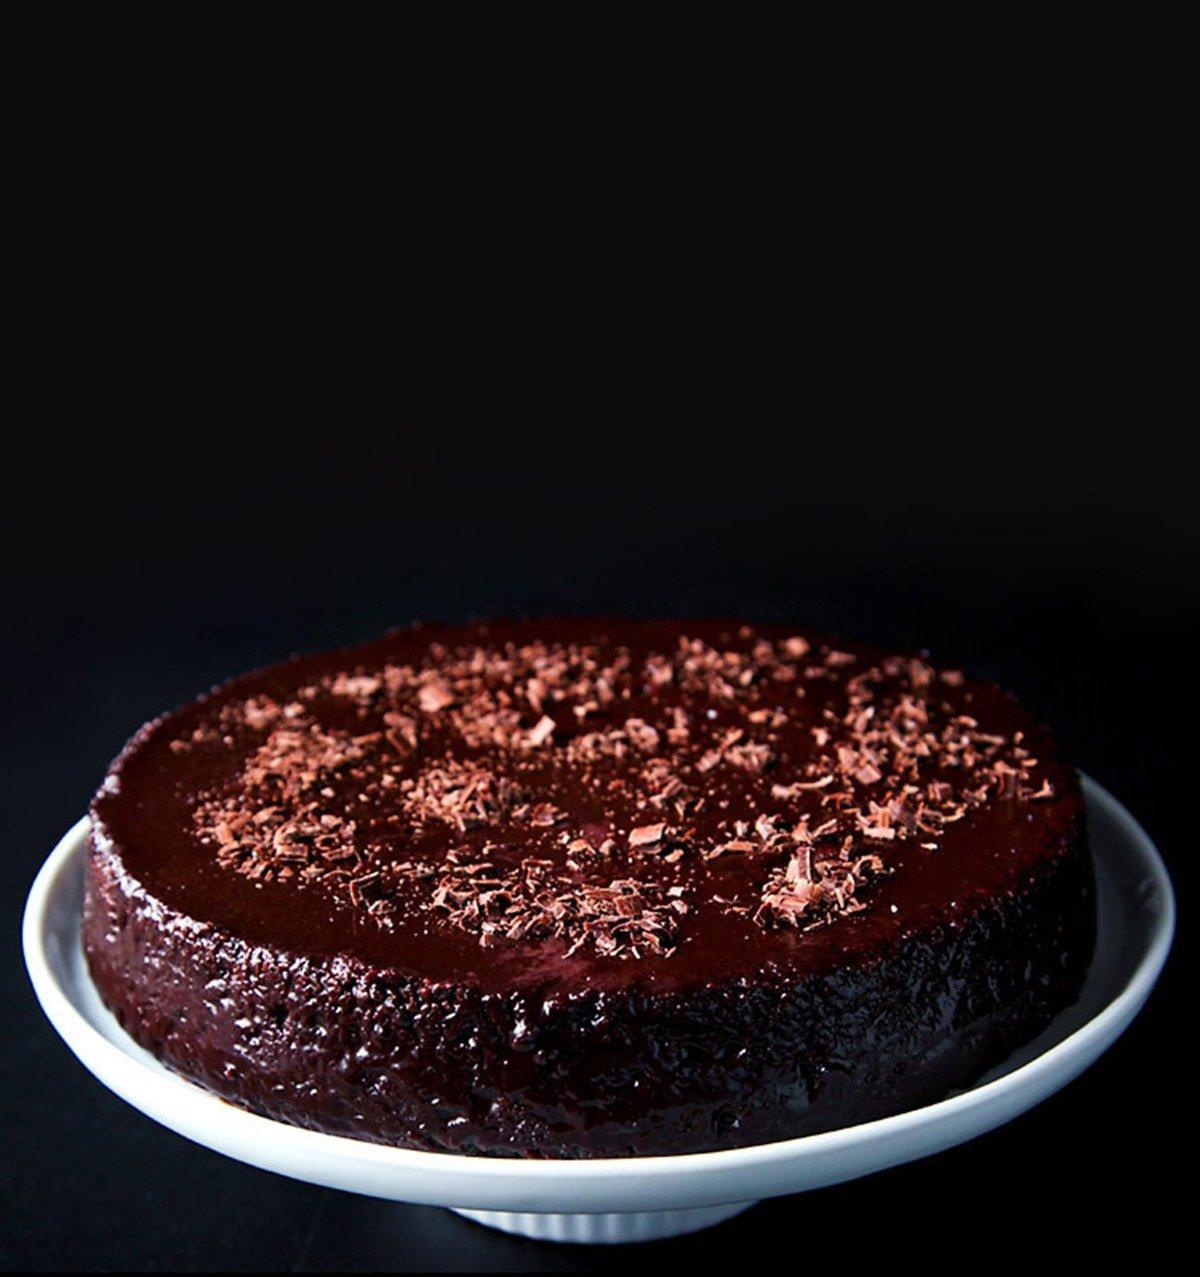 vegan eggless chocolate cake on a white cake stand on a black board